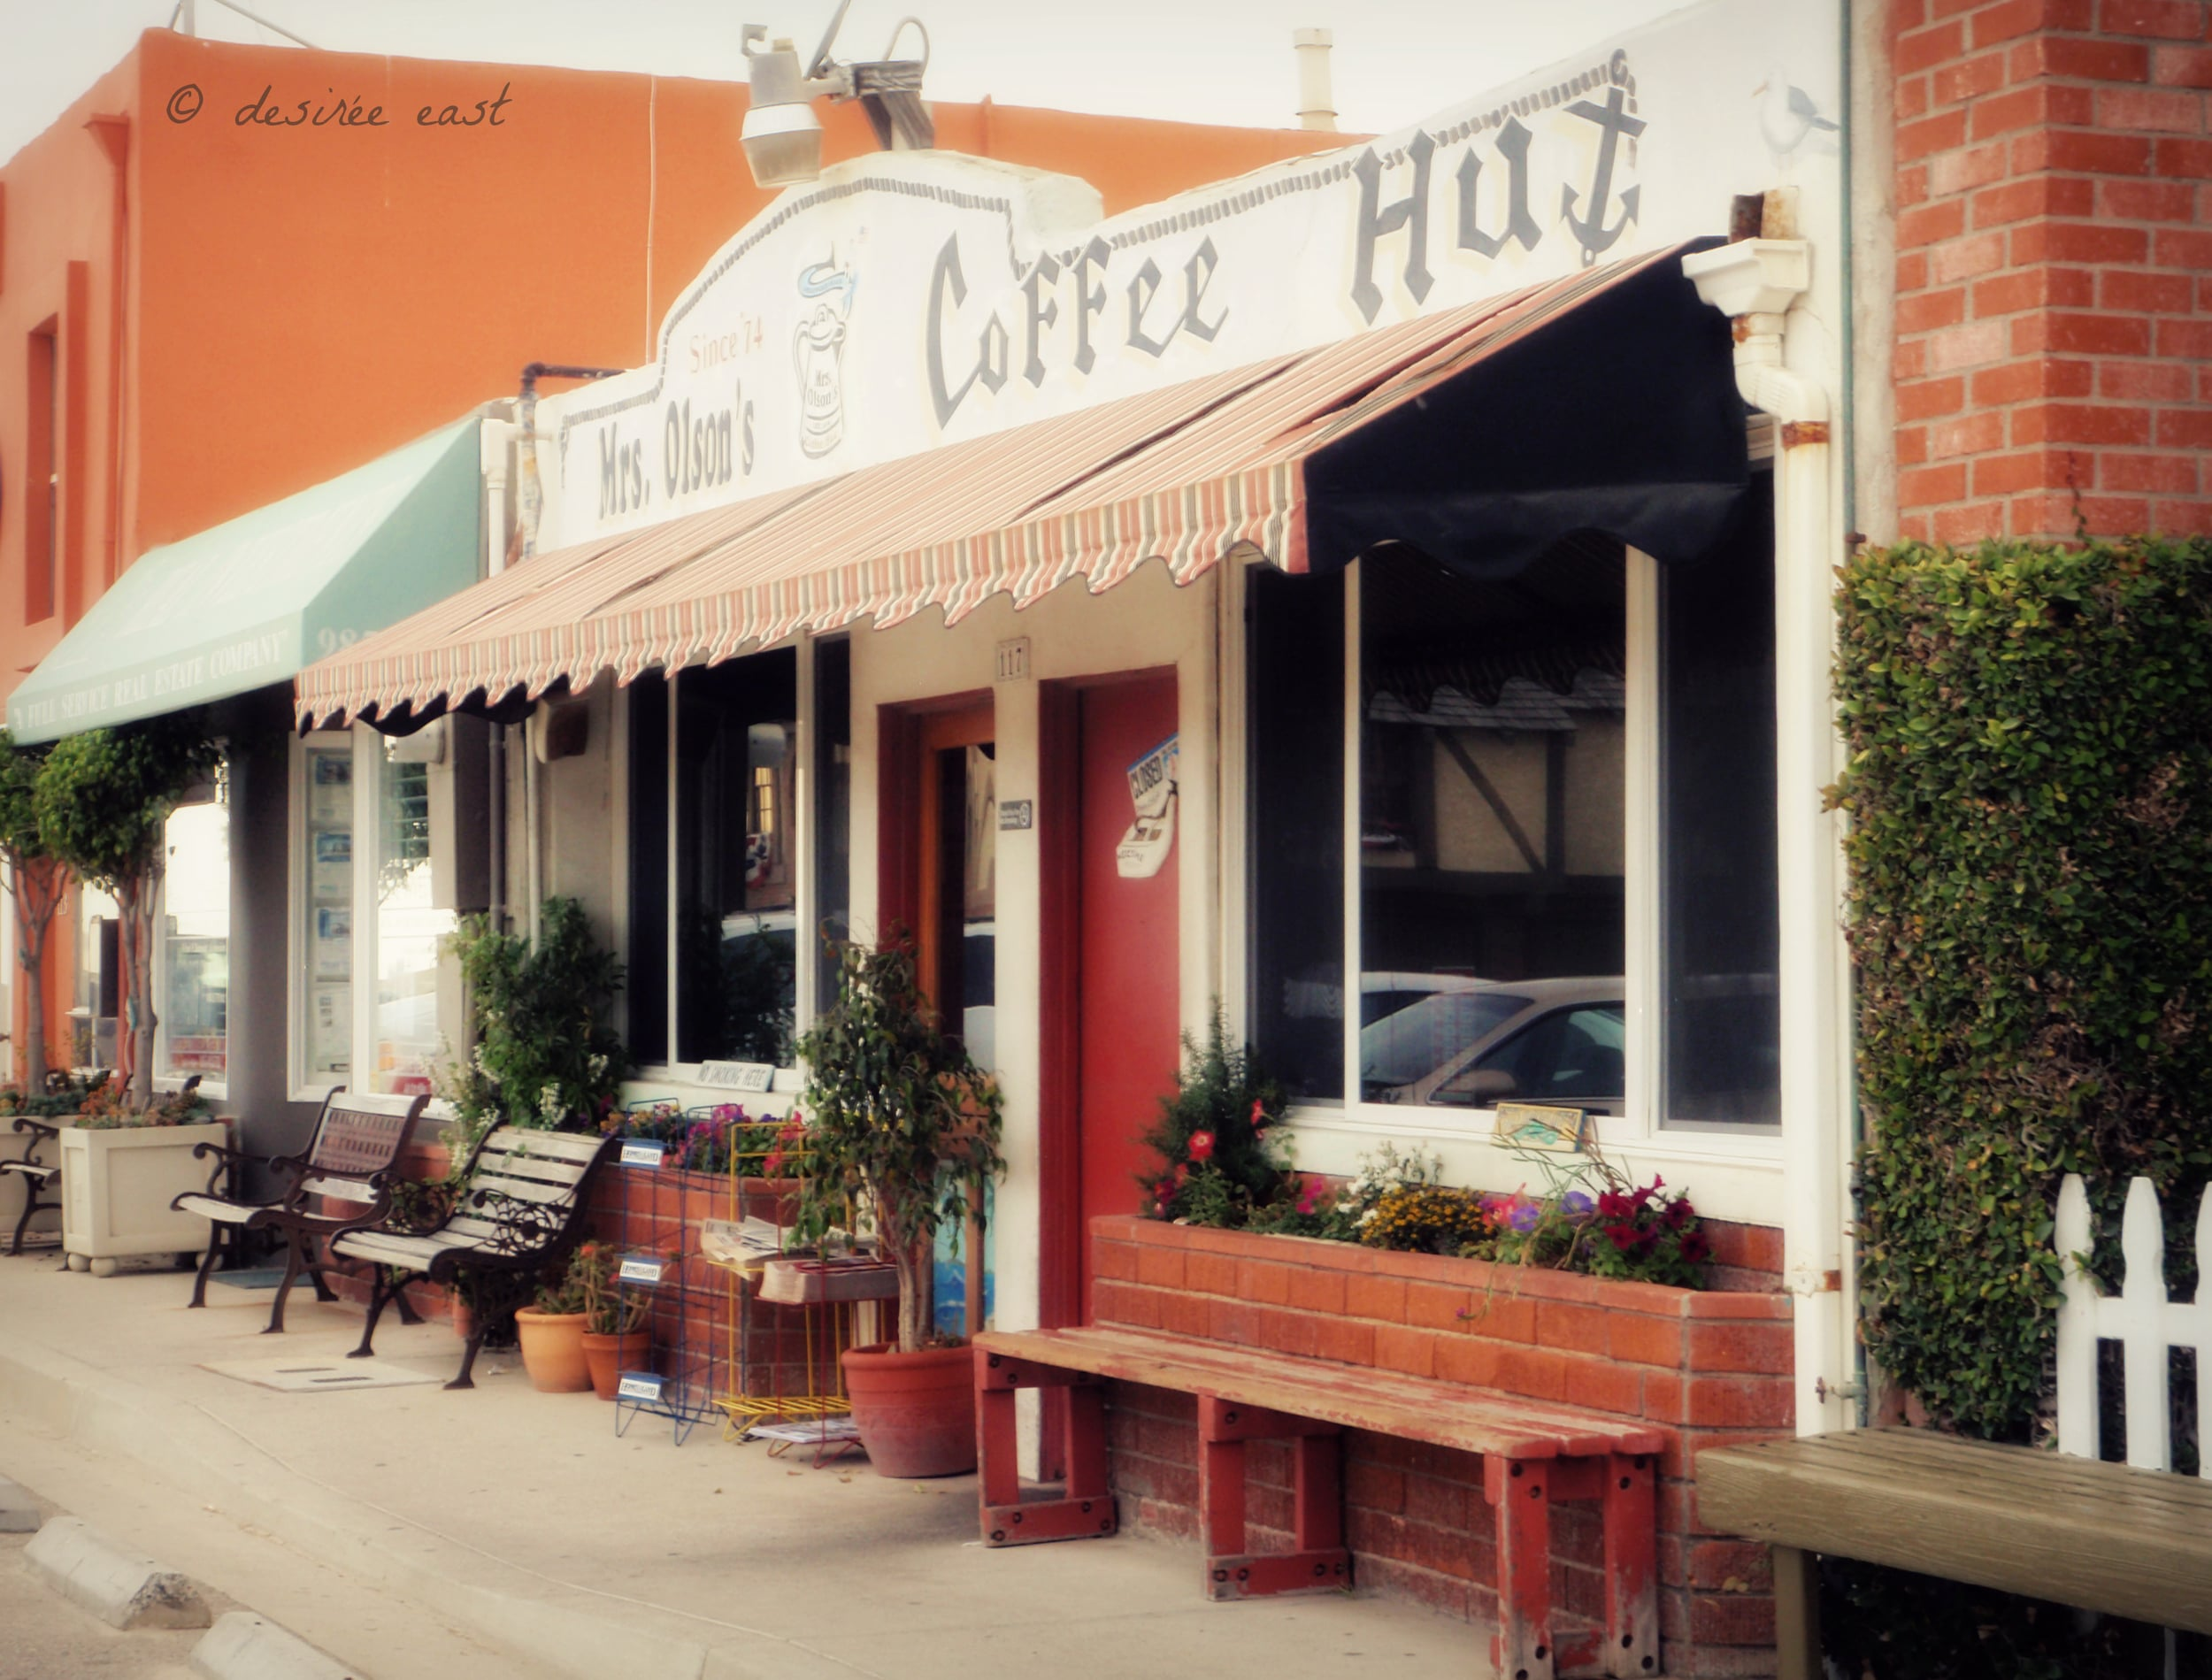 mrs. olson's breakfast spot. hollywood beach, california. photo by desiree east